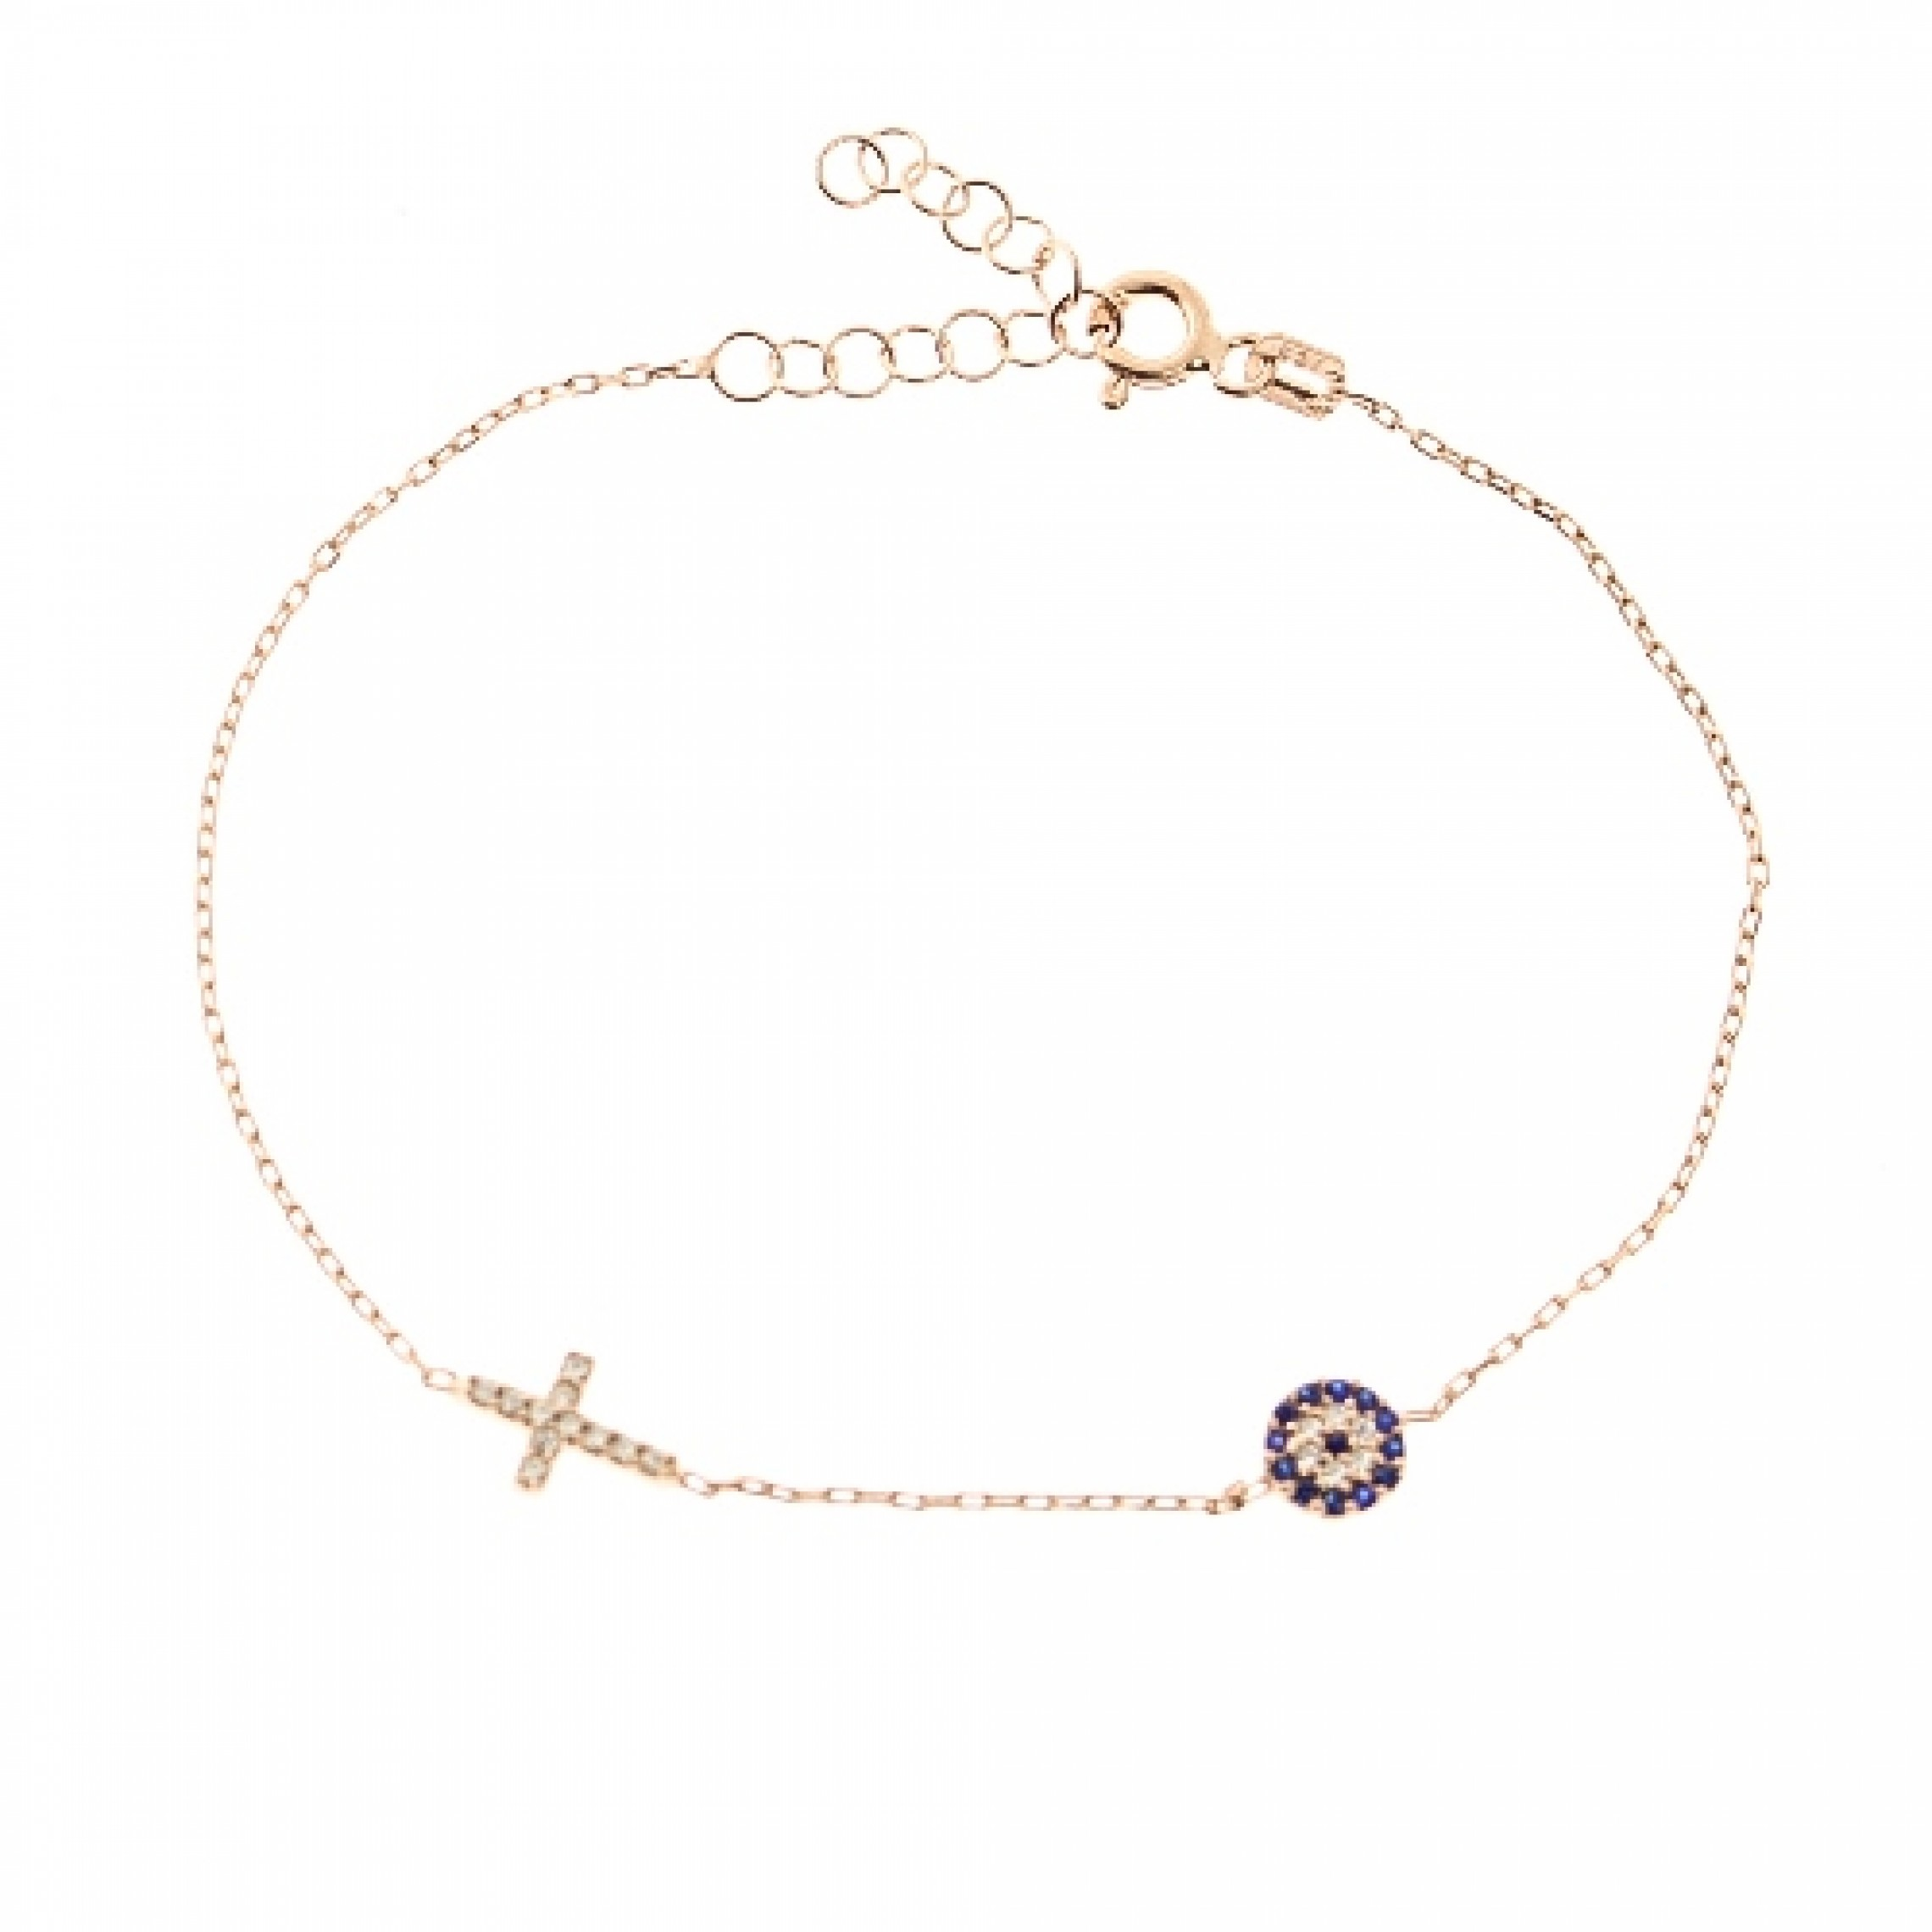 JB-180018 Evil Eye 925 Sterling Silver CZ Bracelet Cross